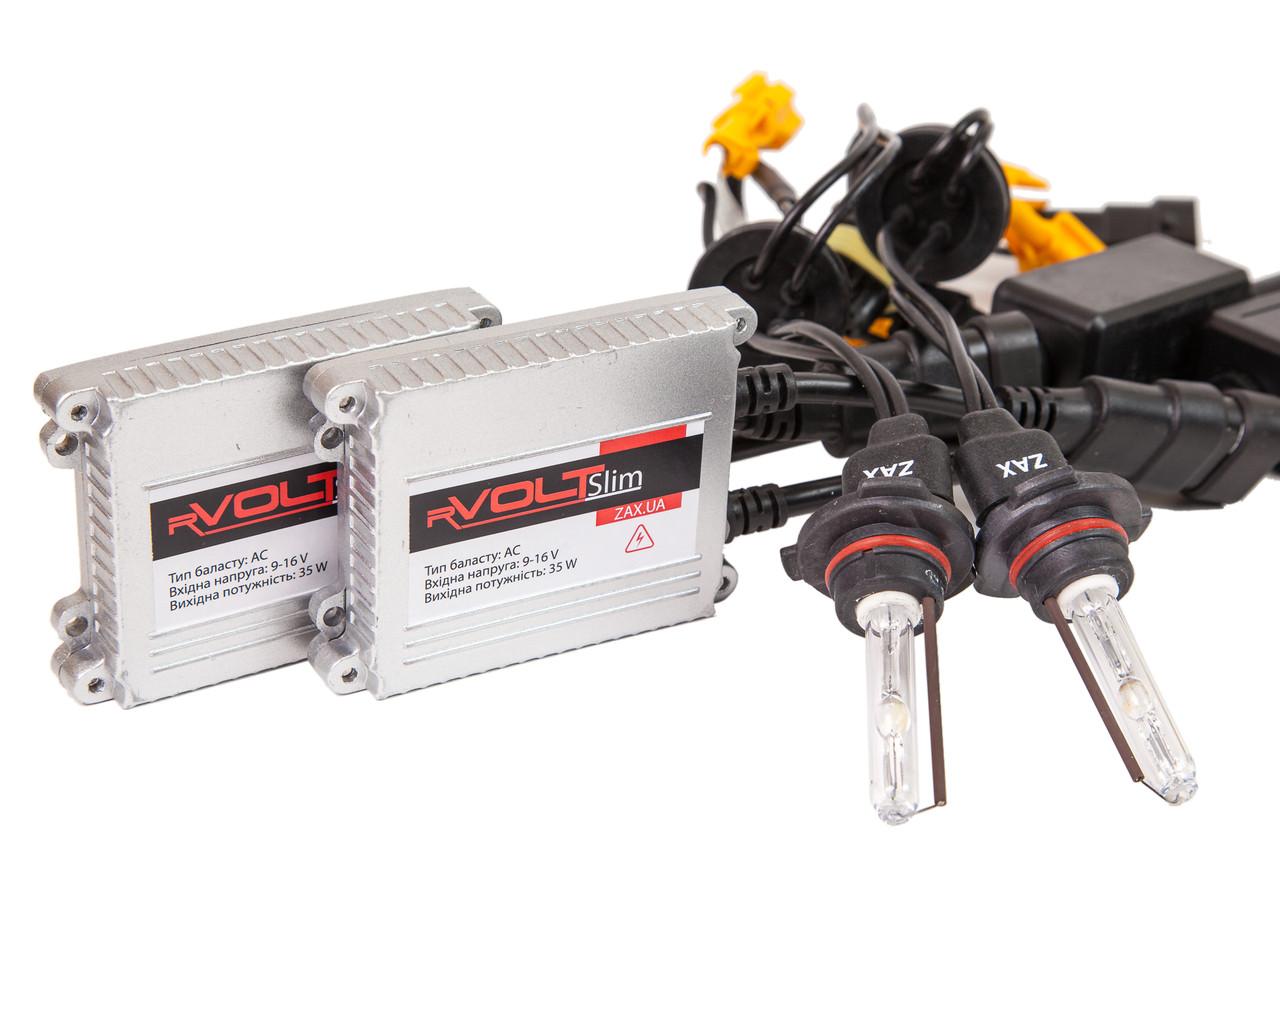 Комплект ксенона rVolt slim 35W 9-16V Zax ceramic HB3 (9005) 6000K